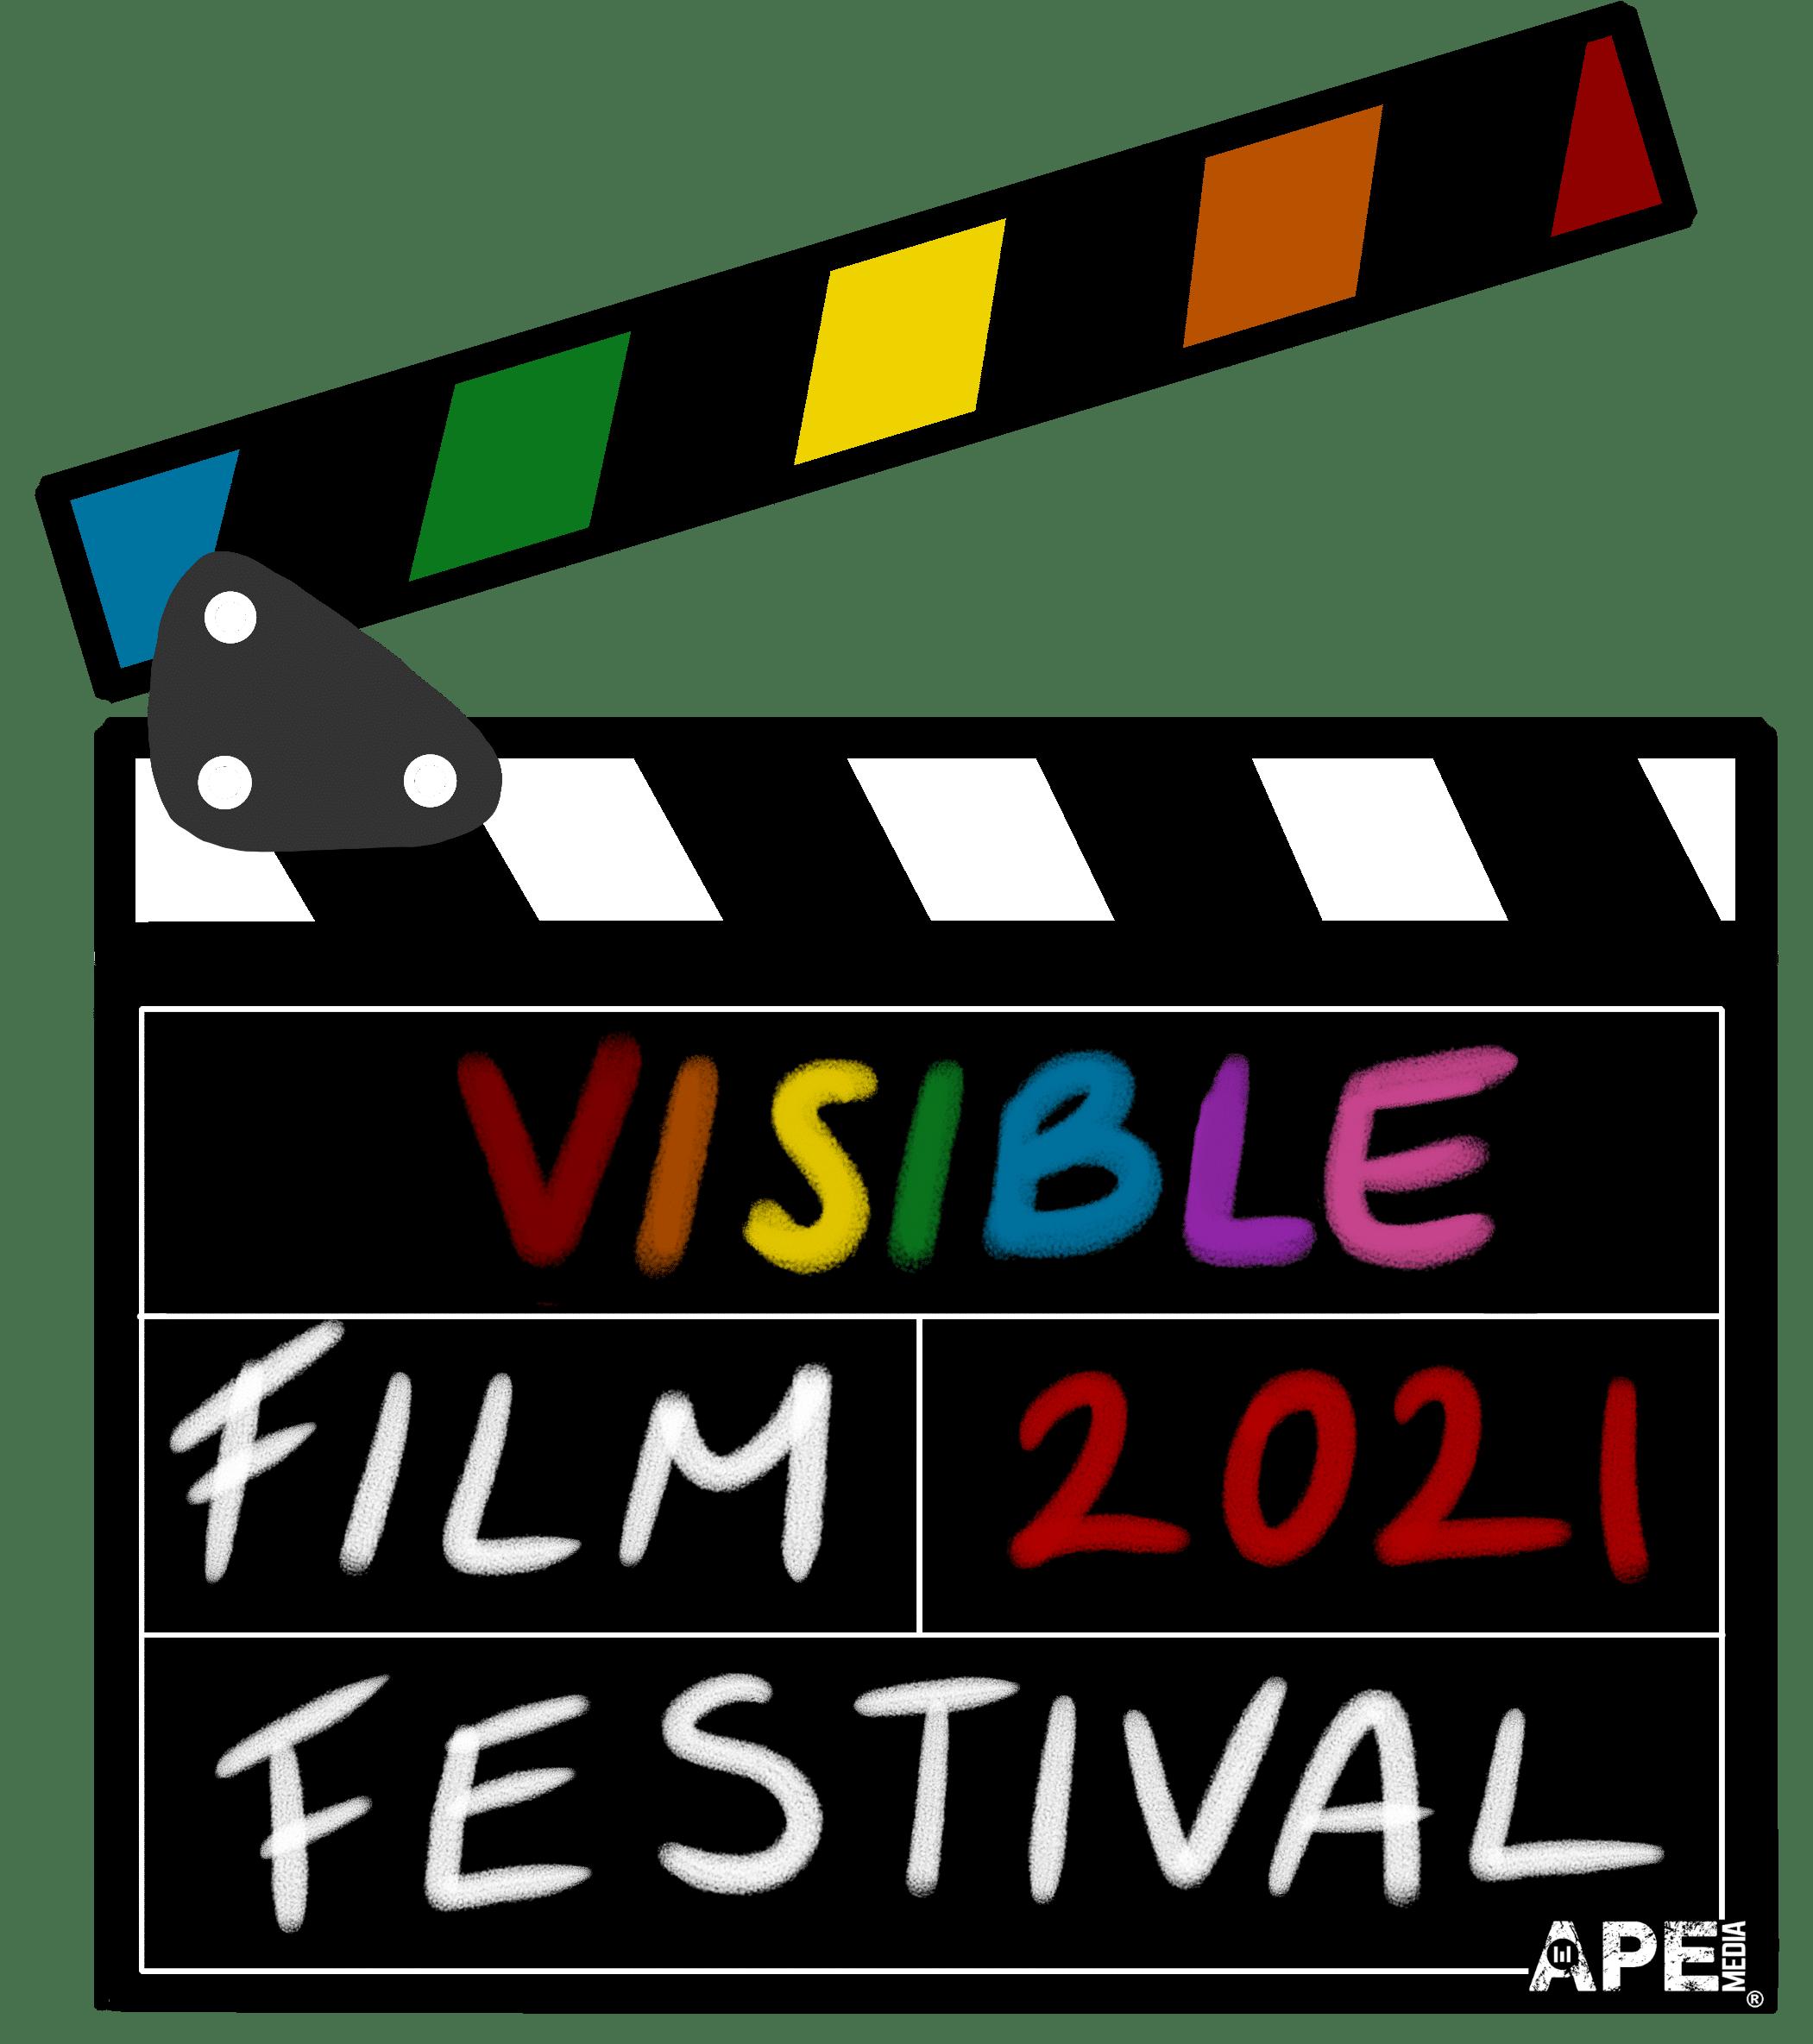 Visible Film Festival